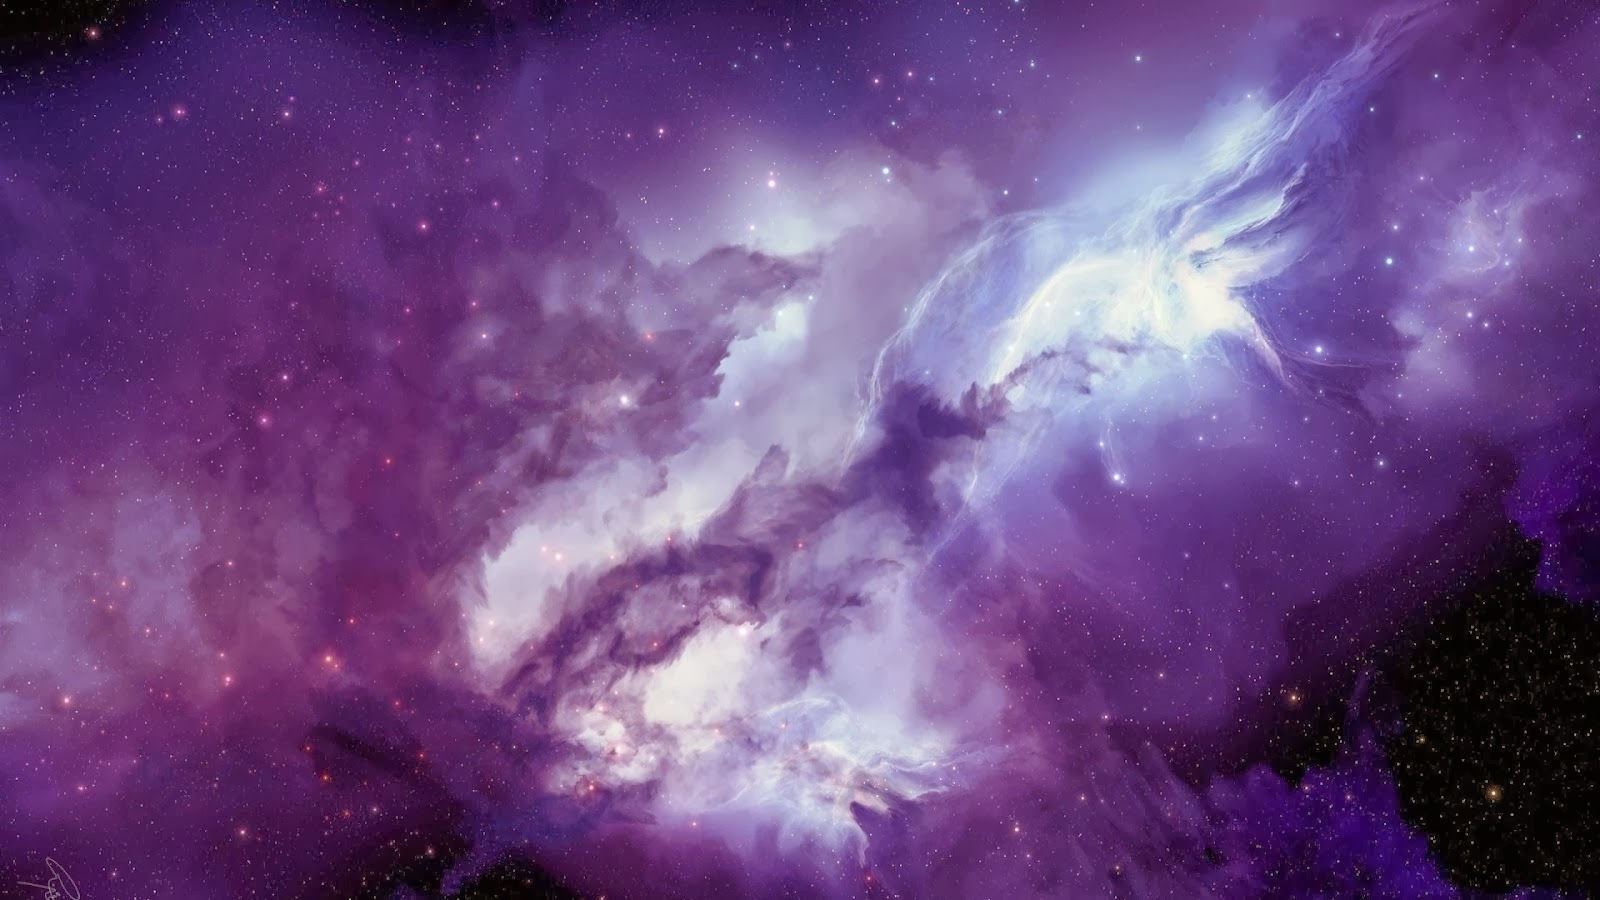 Galaxy Wallpaper 1080p Wallpapersafari